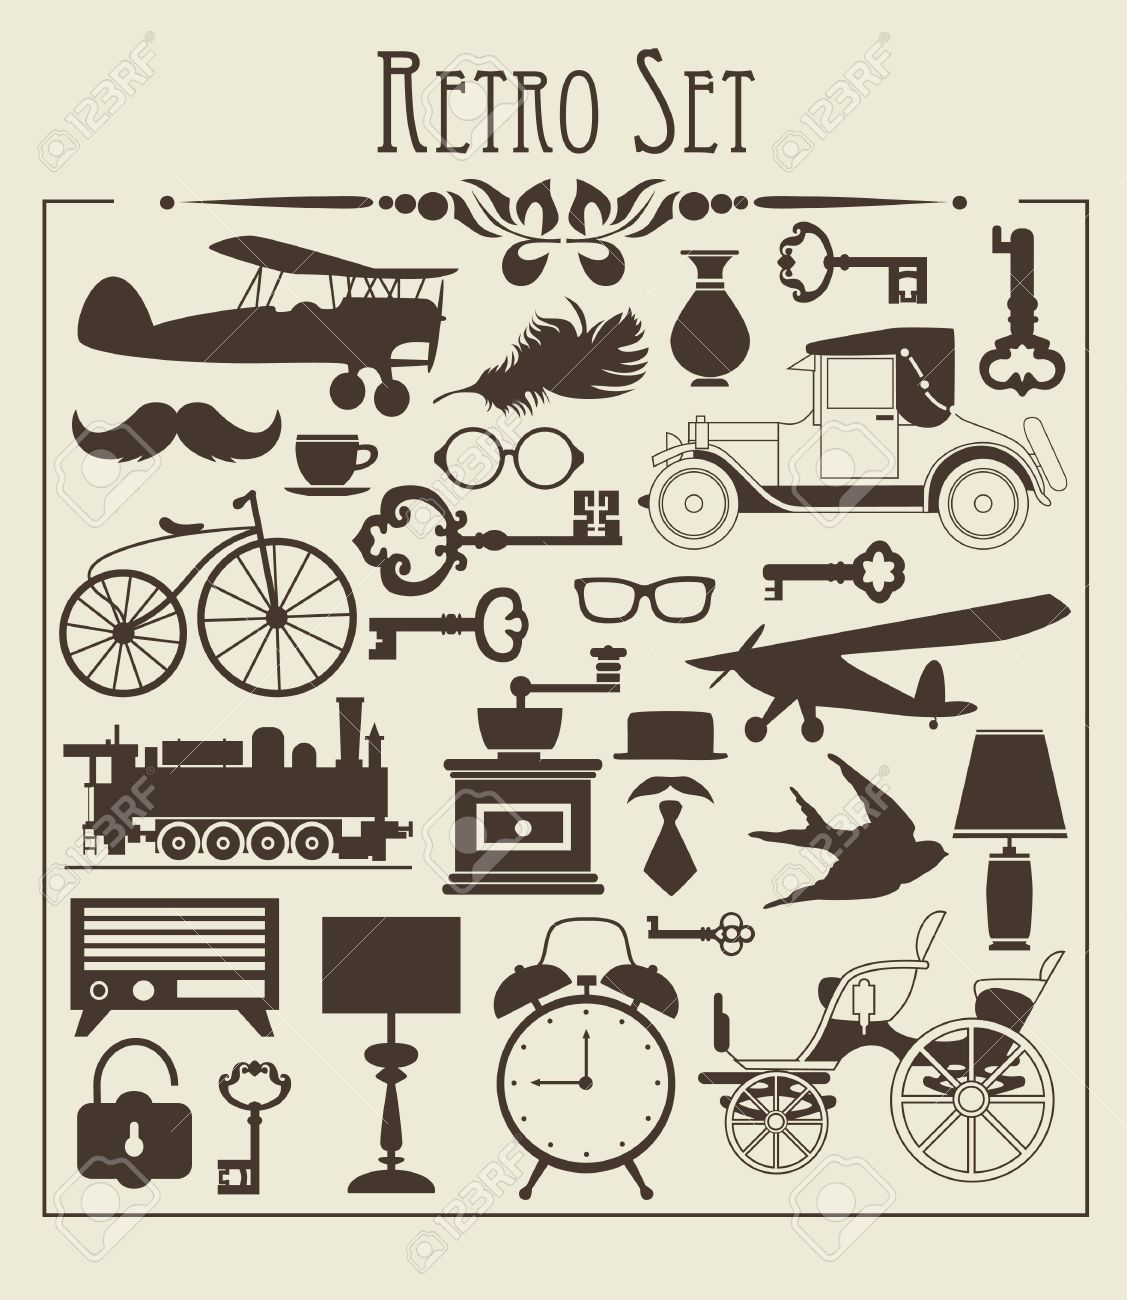 retro objects set vector illustration - 19252333